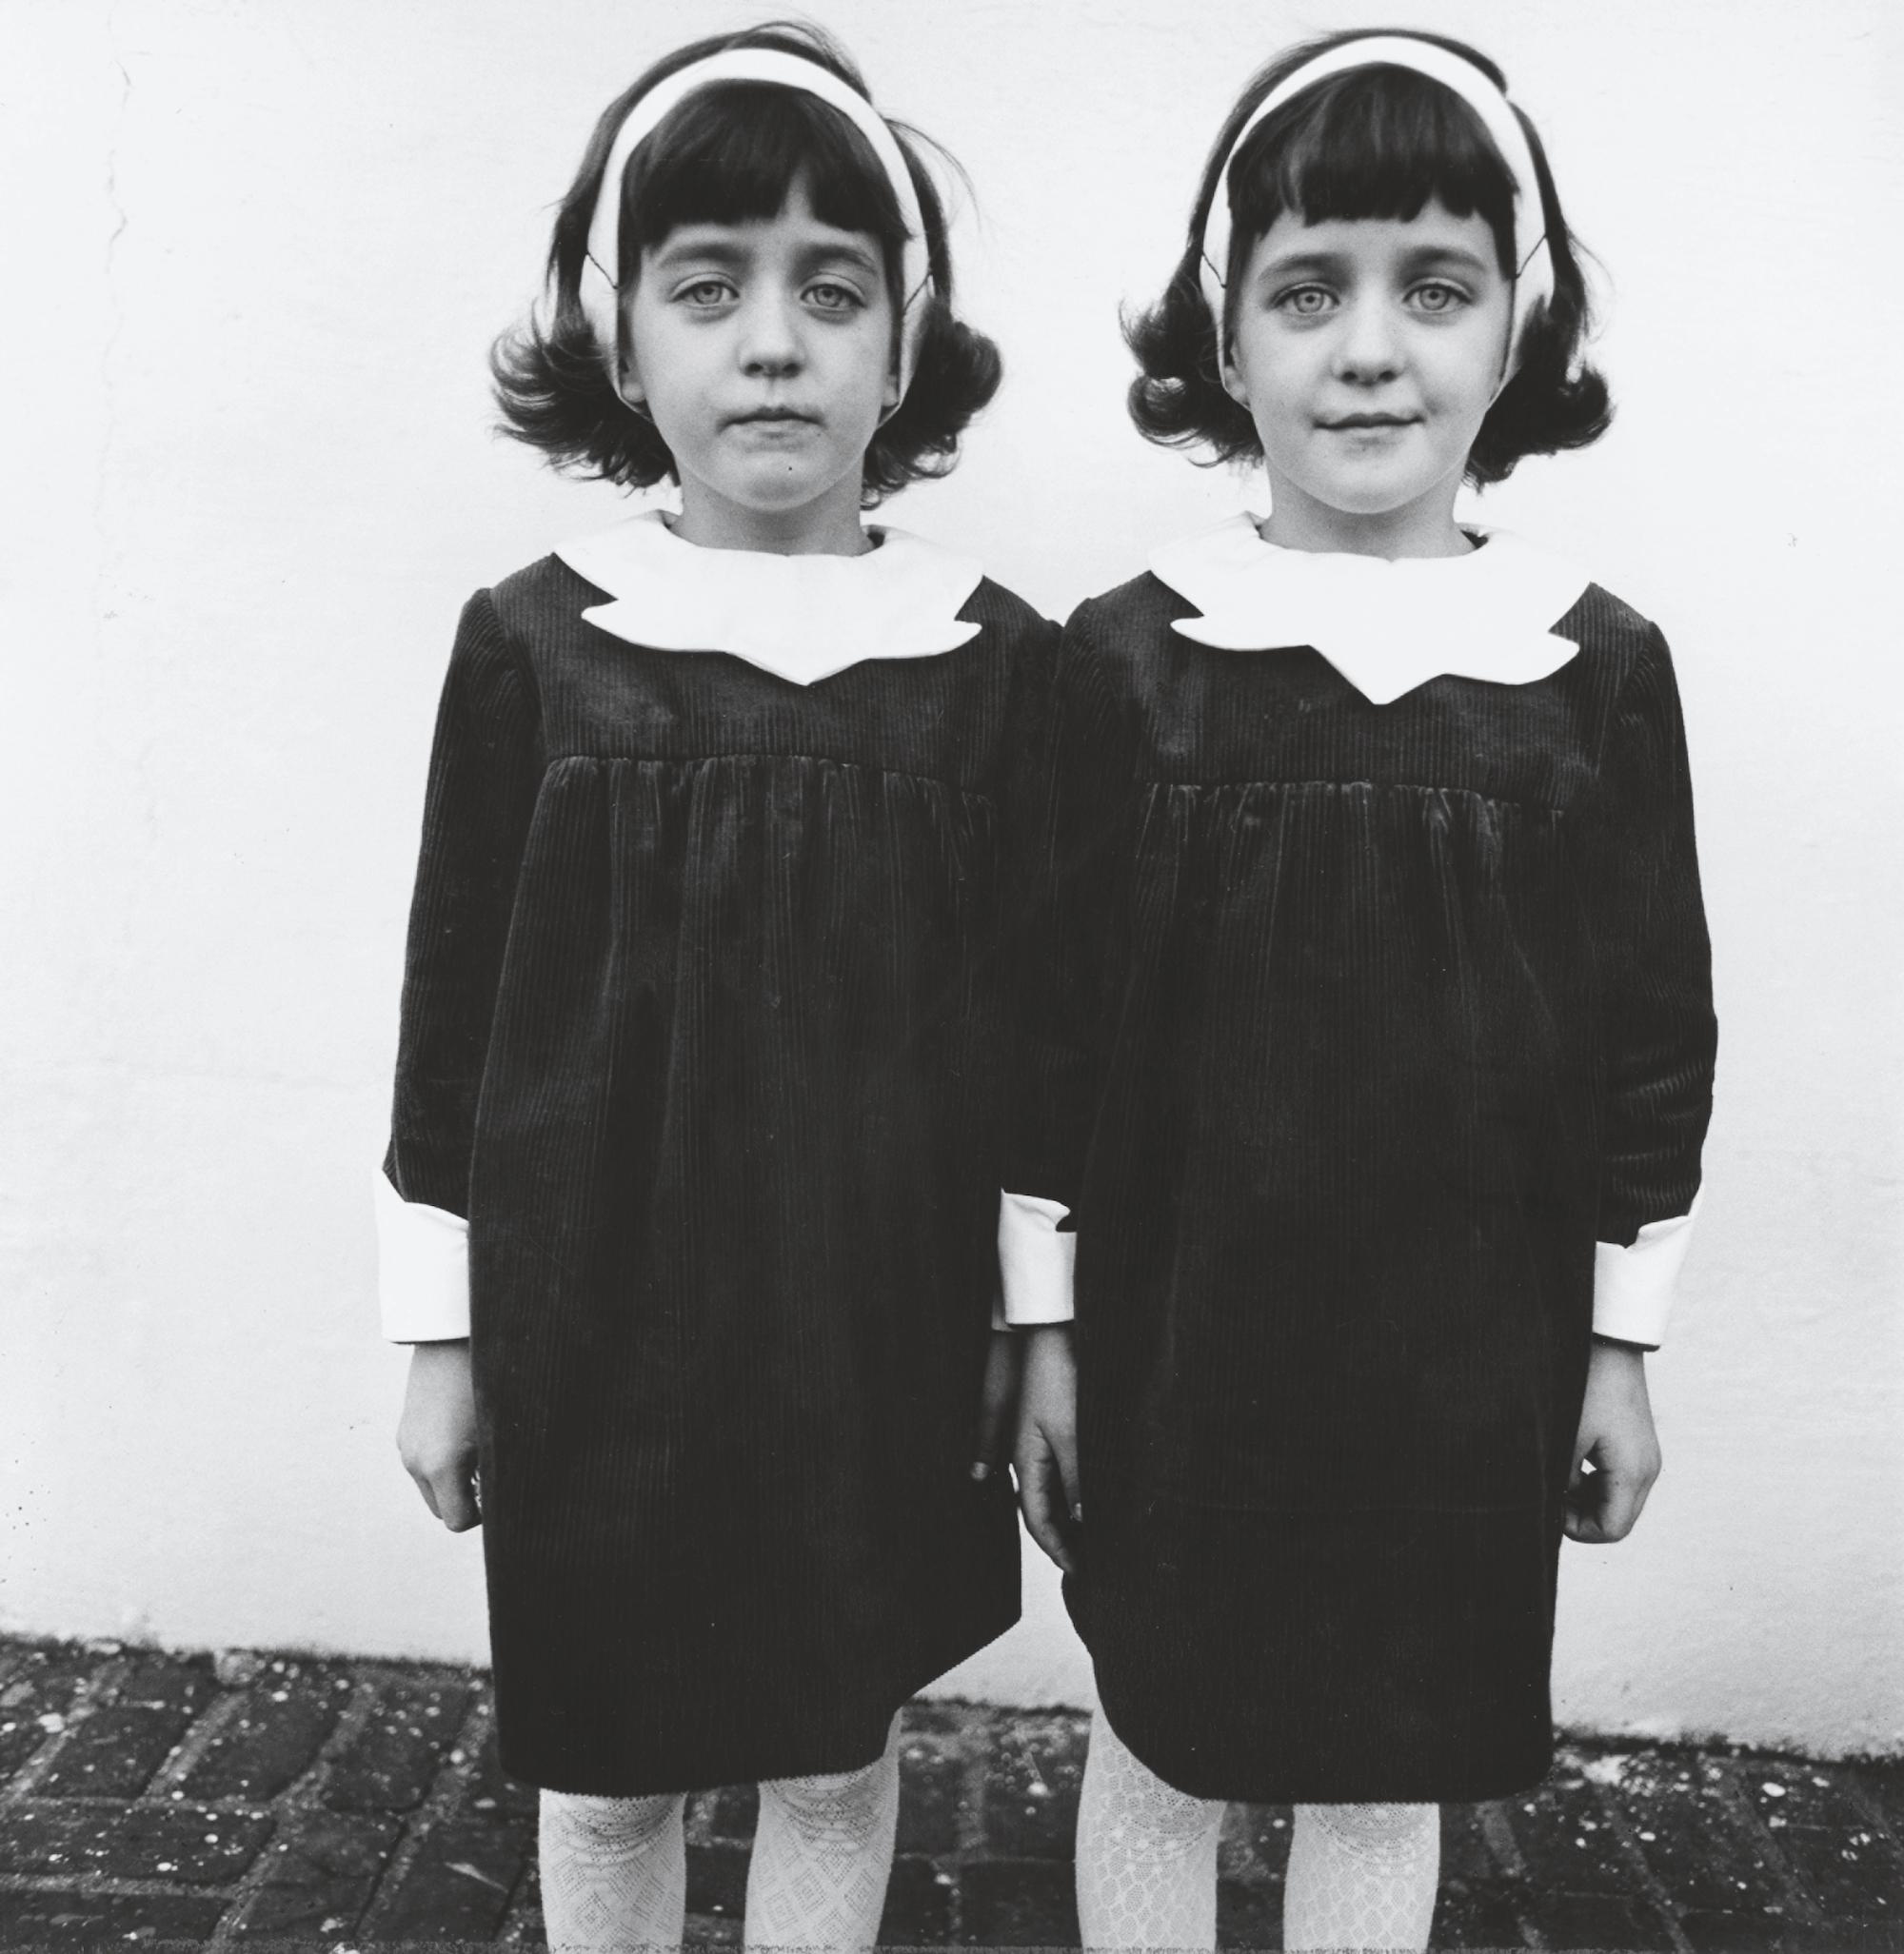 Diane Arbus, Identical Twins, Roselle, N.J., 1966, 1966, printed between 1967 and 1970 © The estate of Diane Arbus